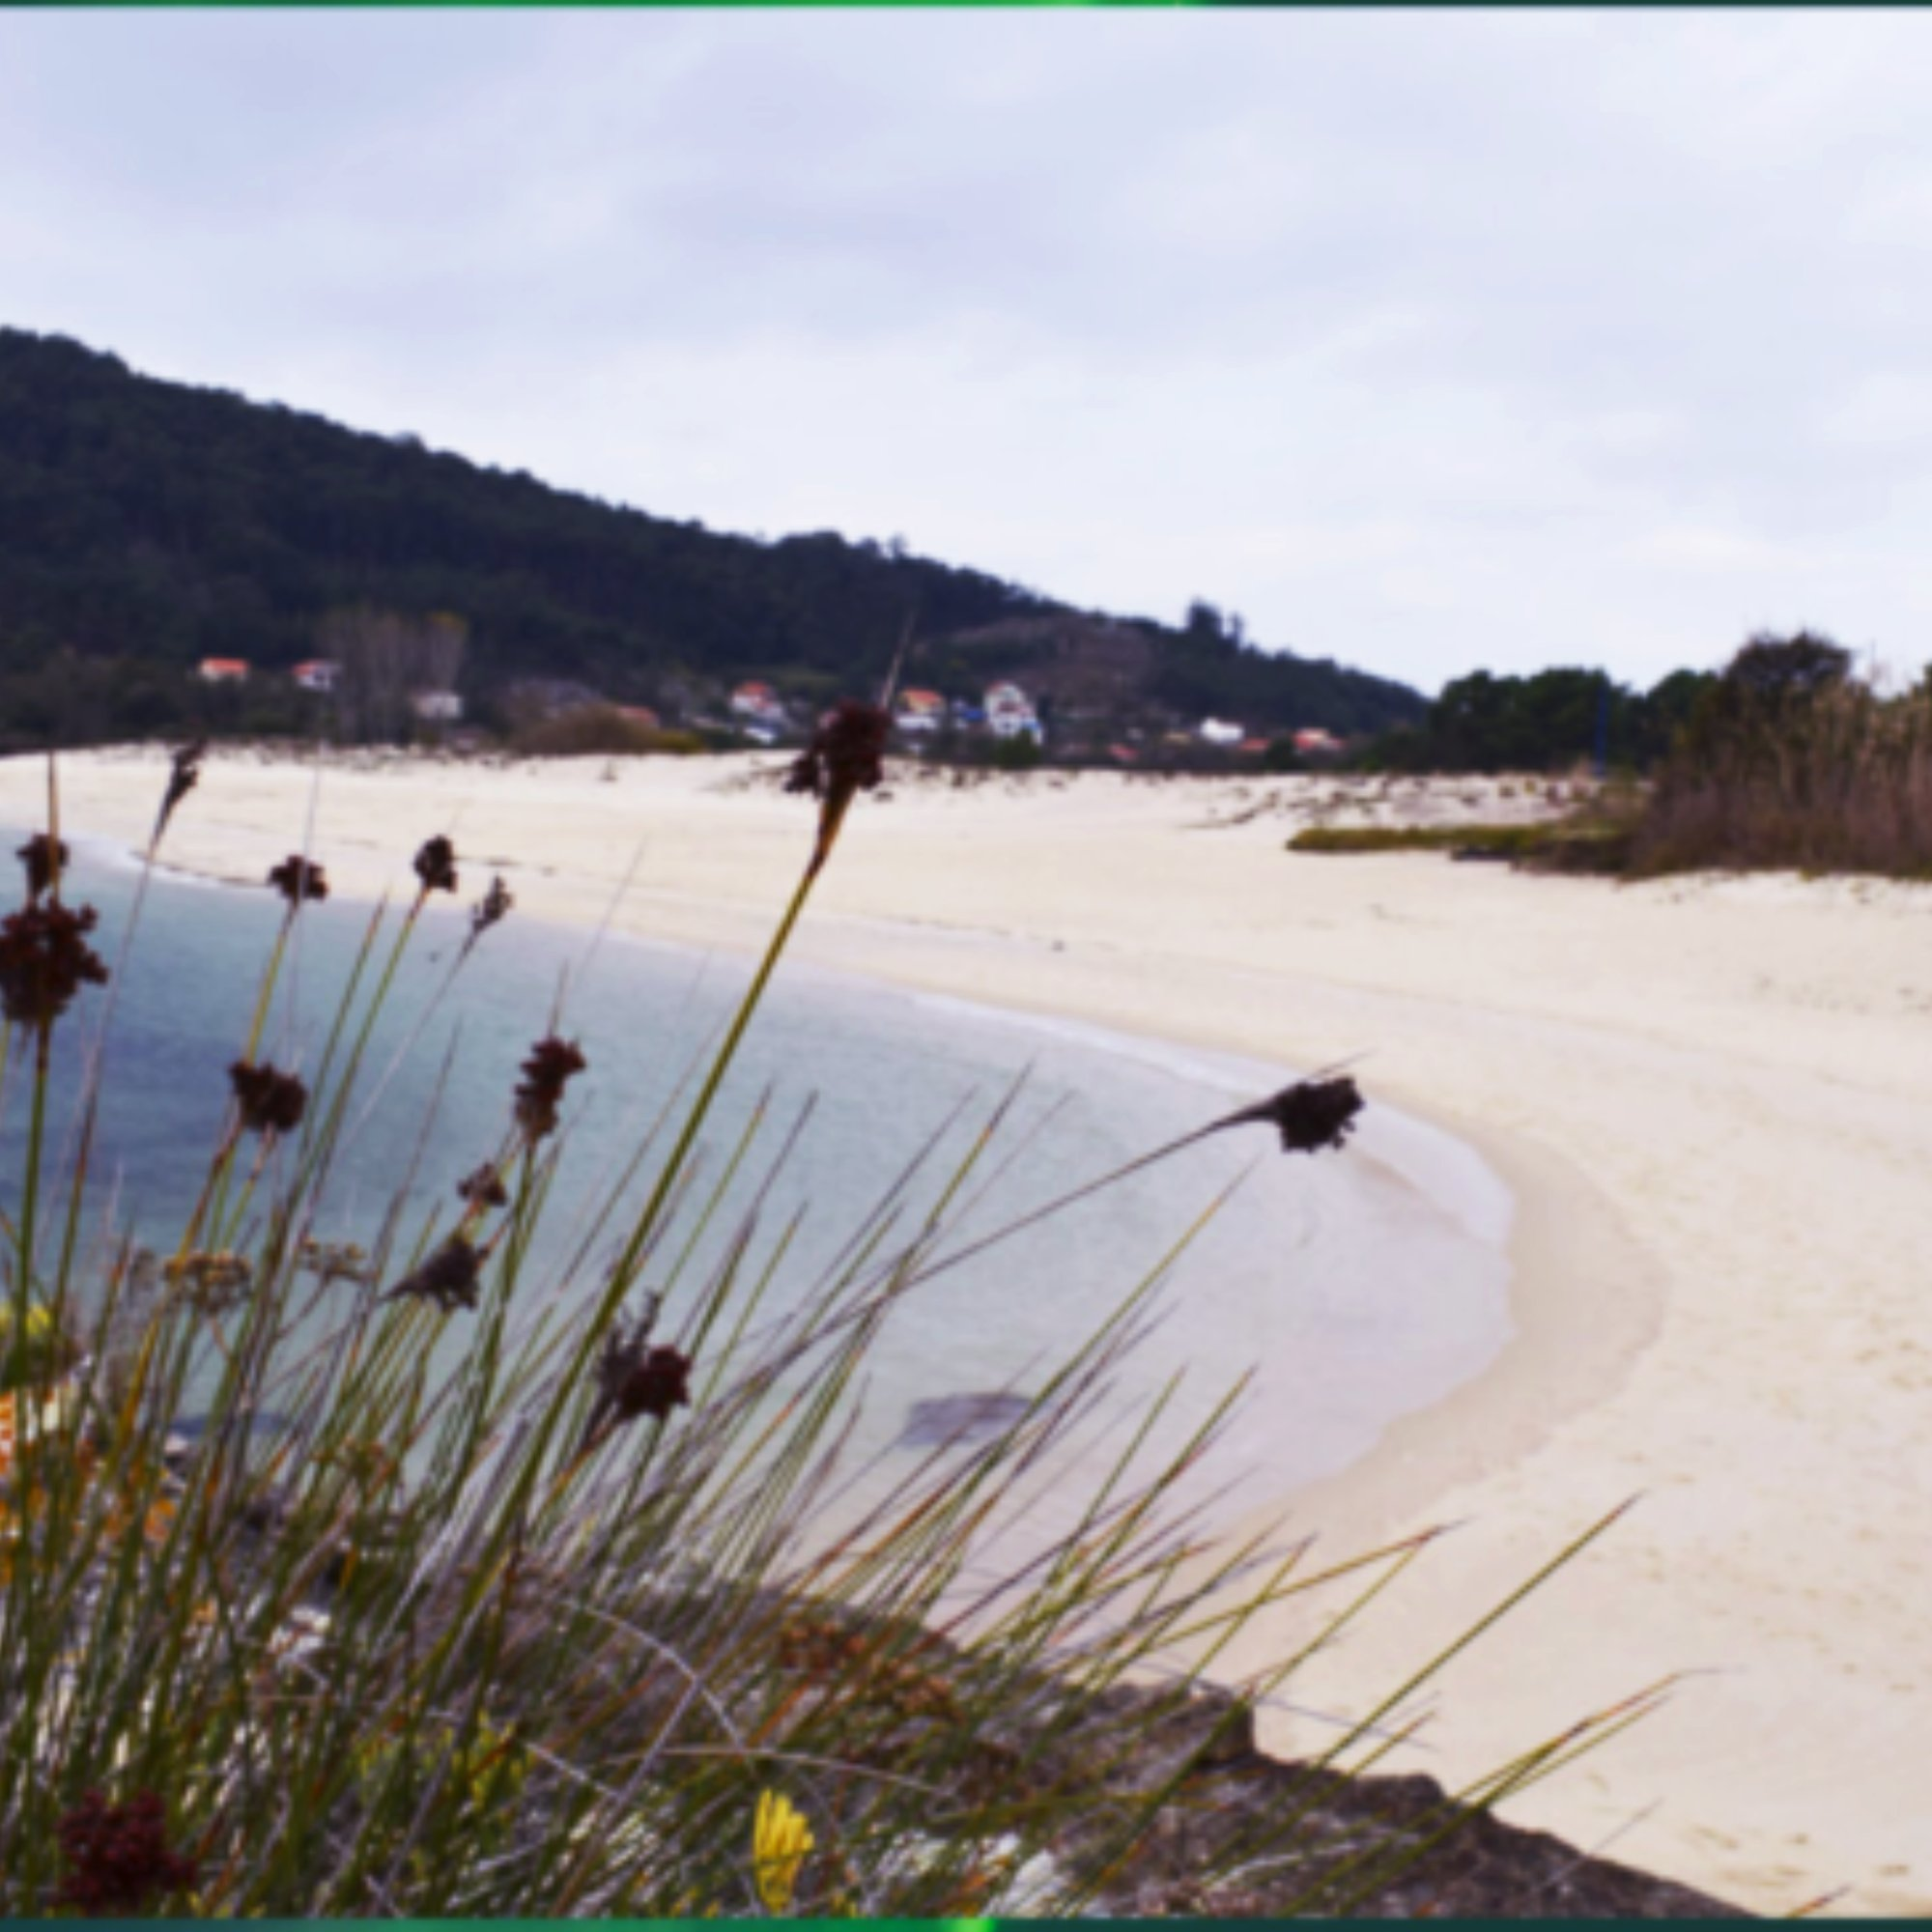 juncos-arena-playa-mar-casaomillon